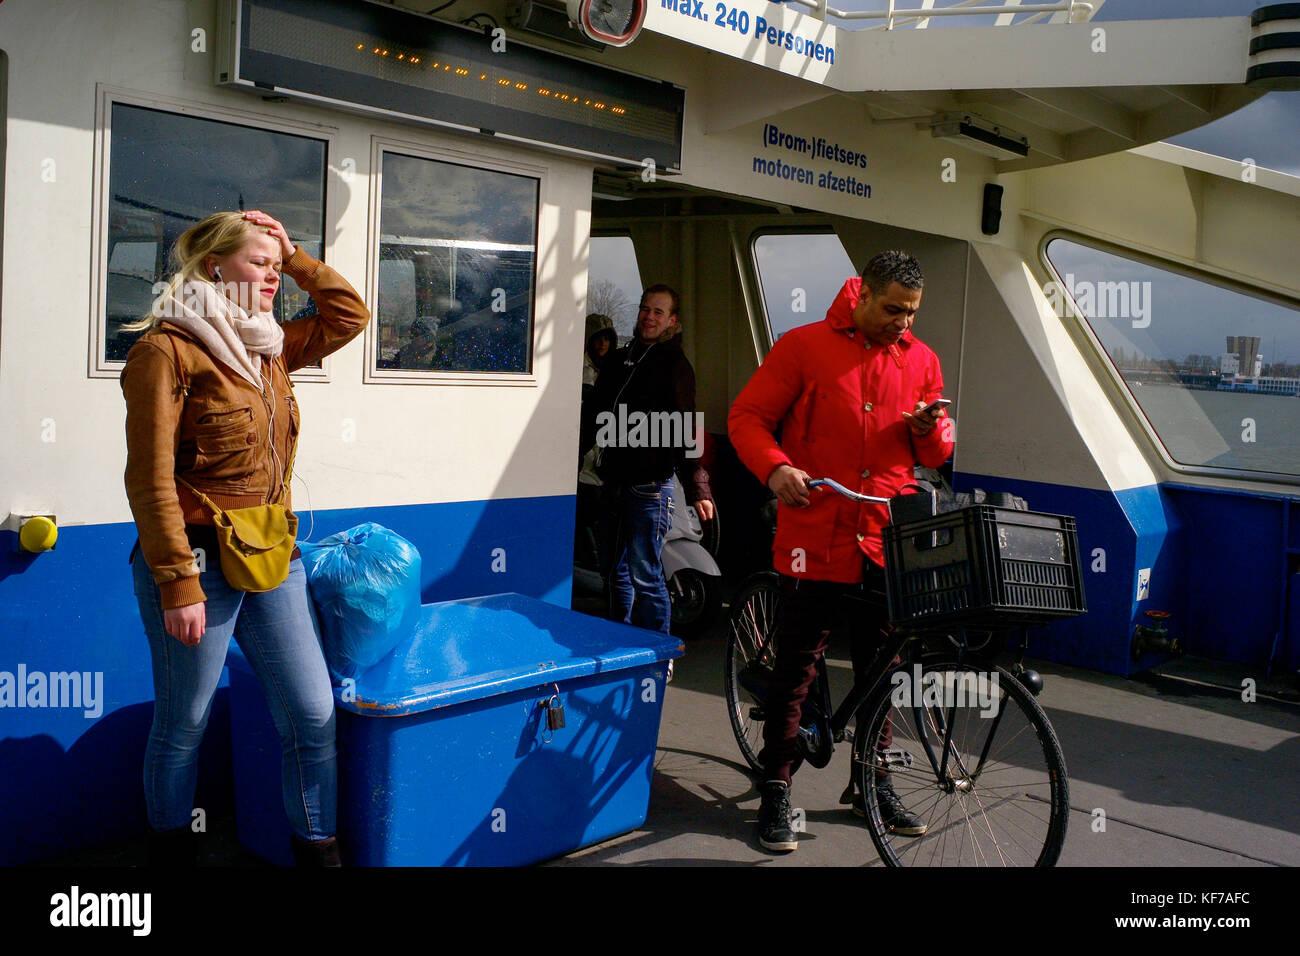 Ferry-boat crosses Ij-river, Amsterdam, Netherlands - Stock Image